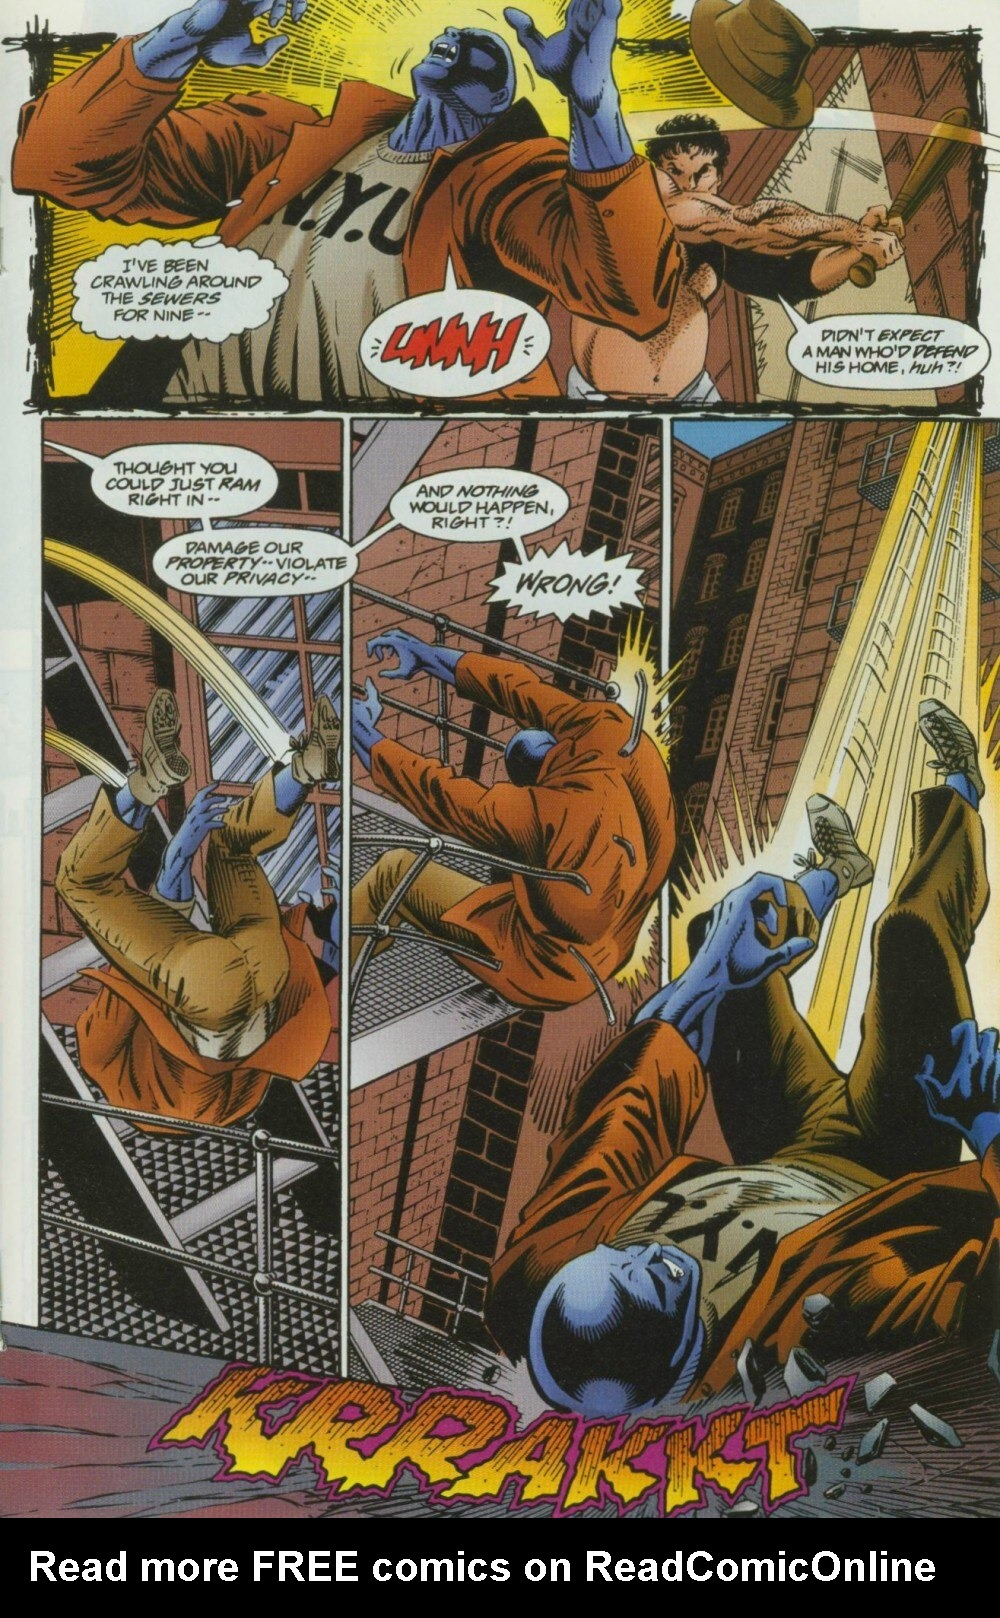 Read online Sludge comic -  Issue #10 - 18